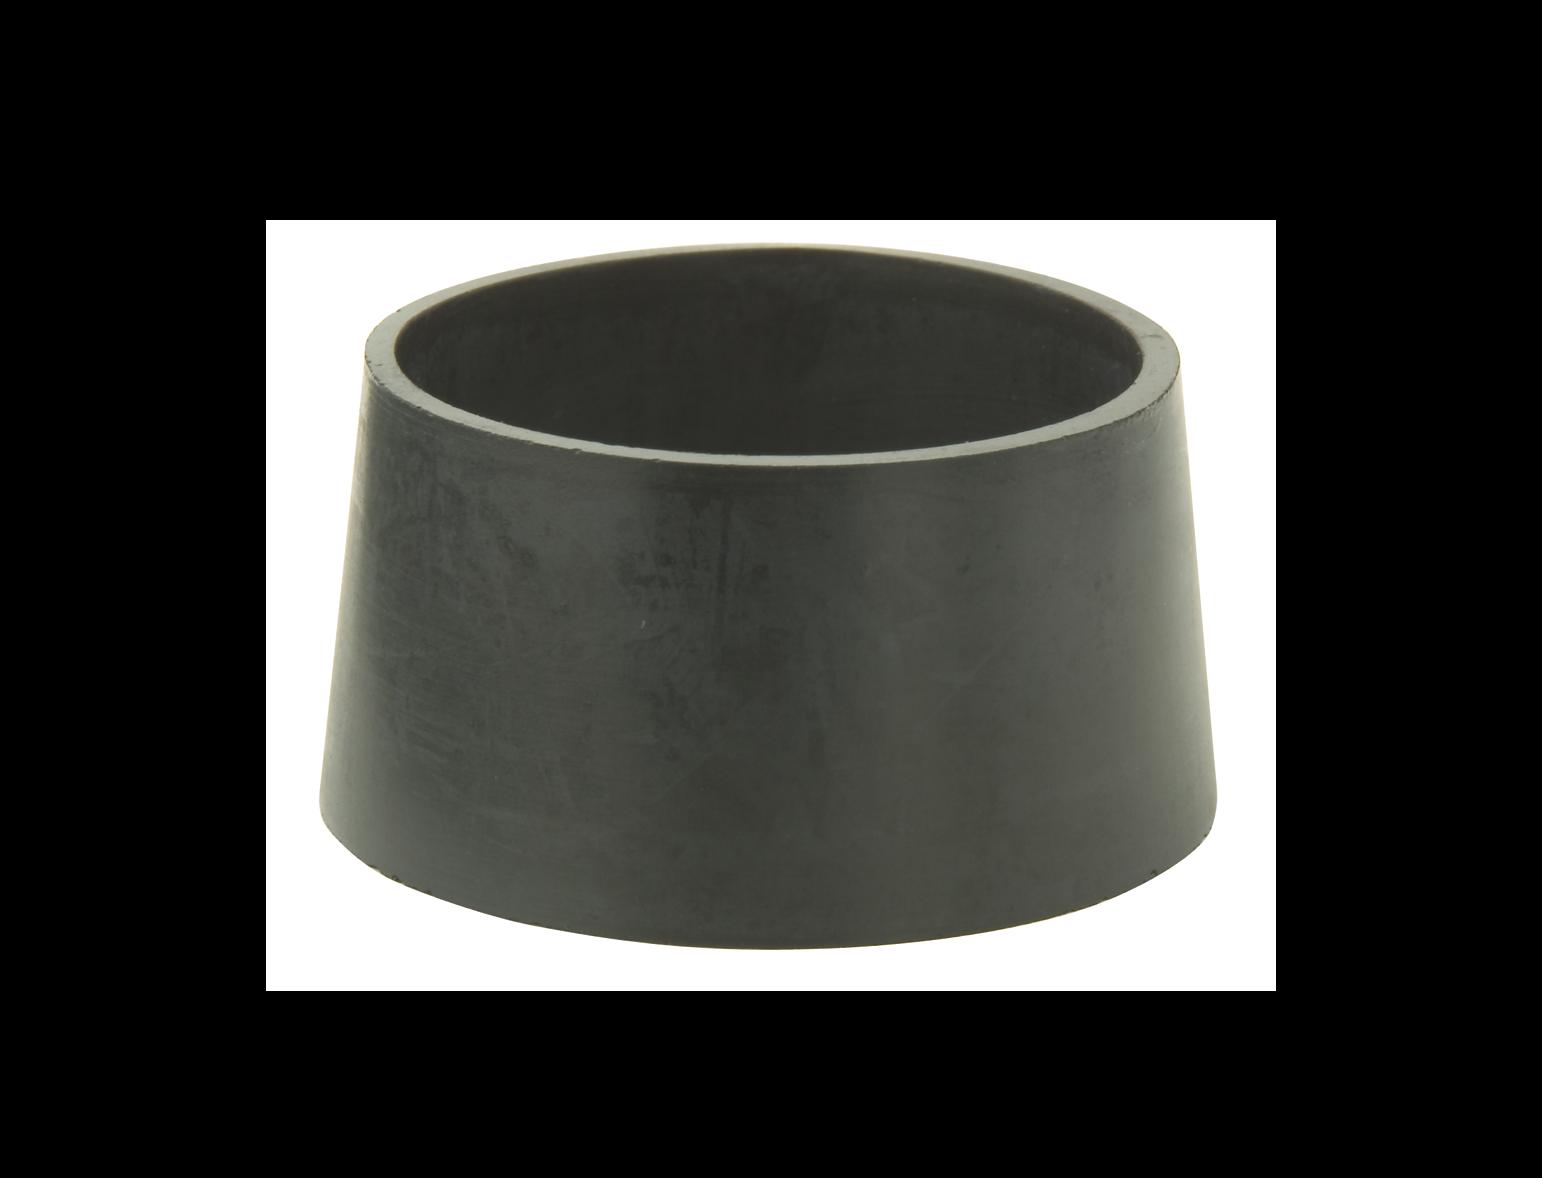 Image of Skellerup Reflex Cone Seal